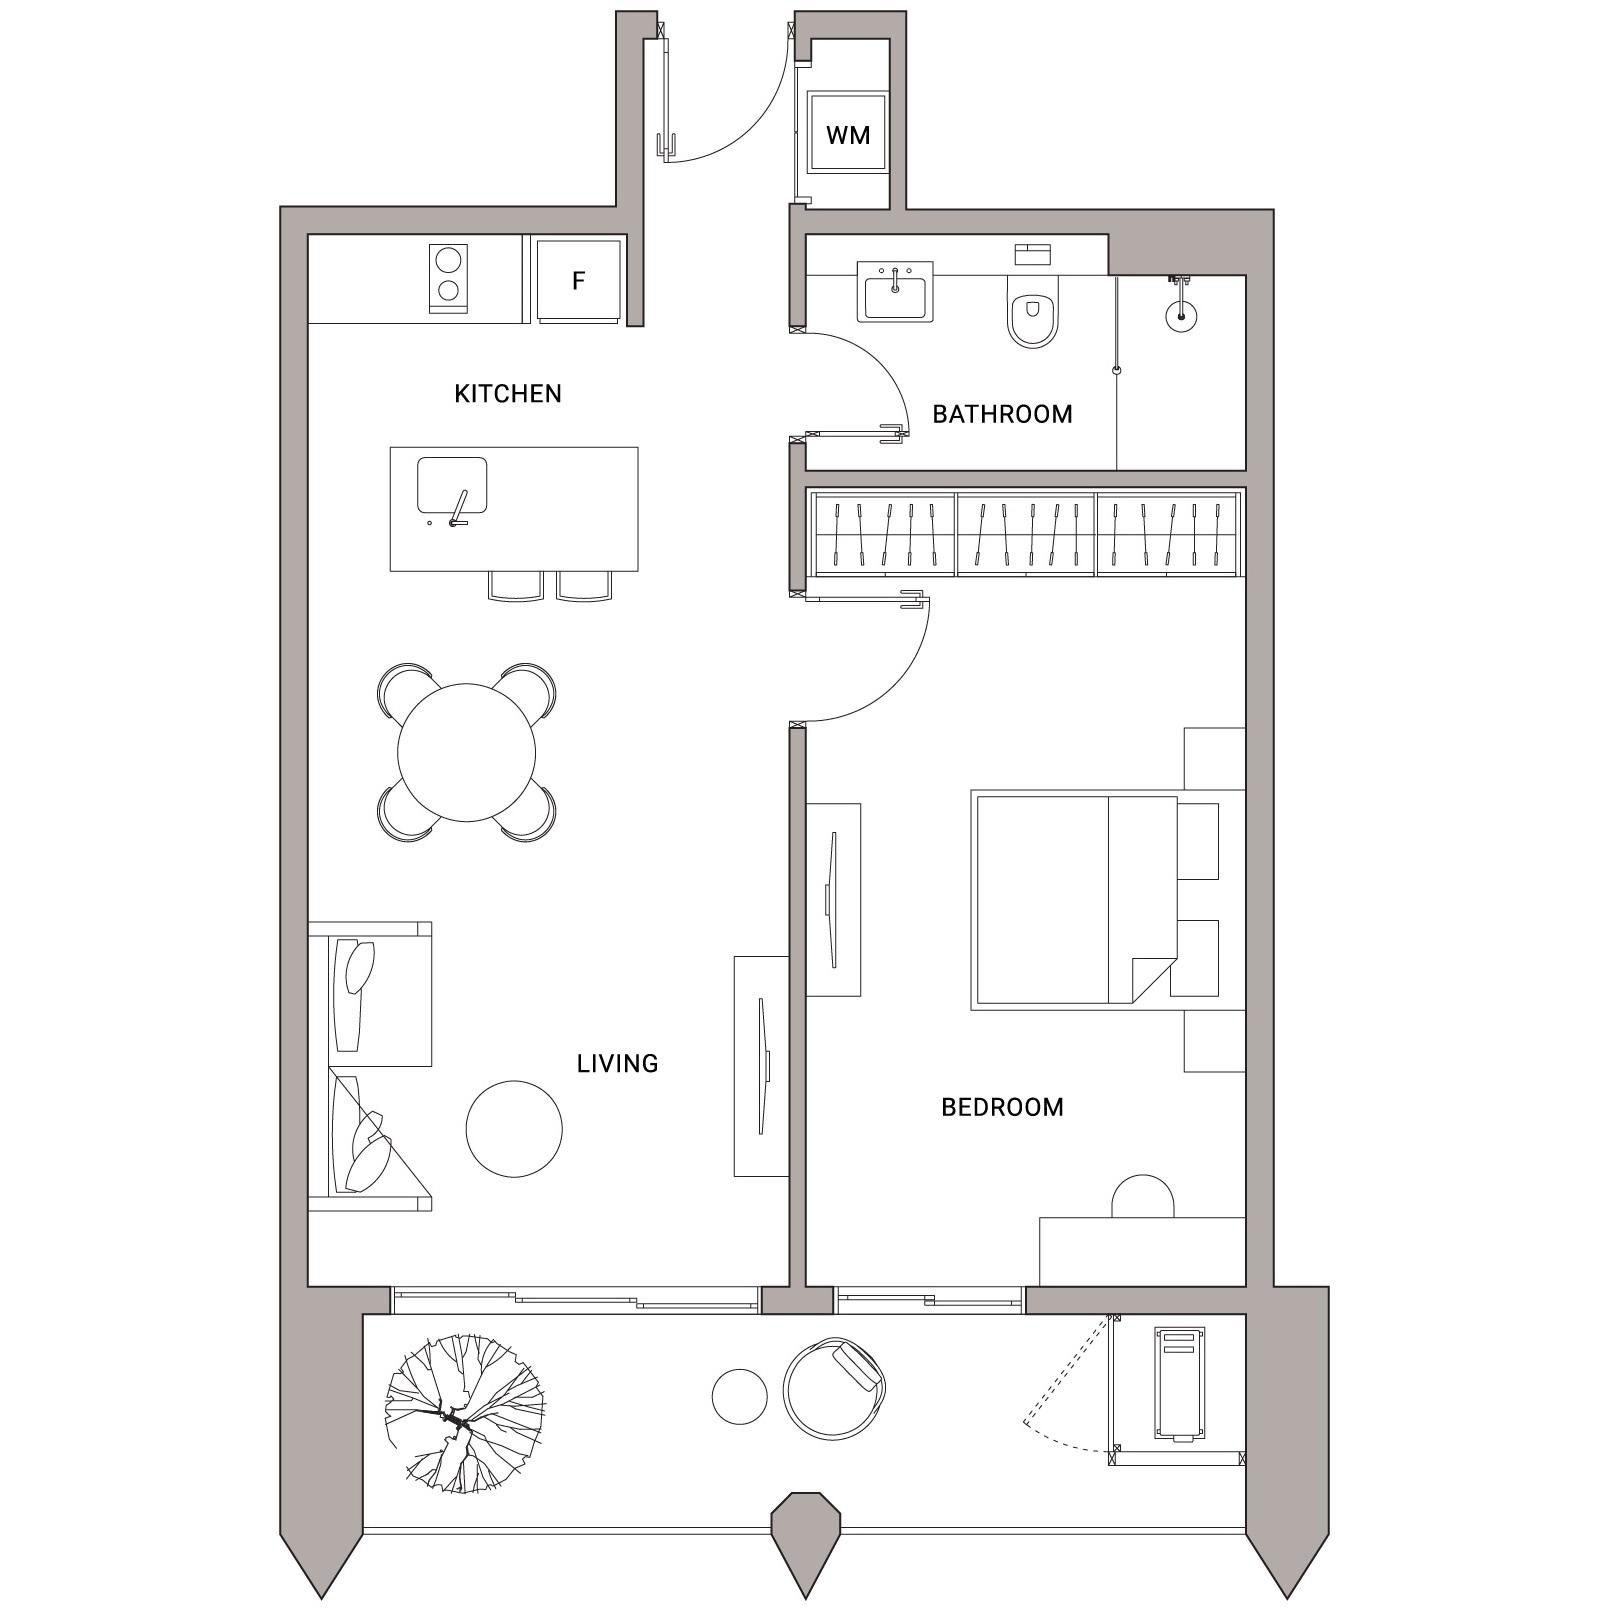 Urbanland - Embassy Central - Phnom Penh Luxury Condominium - A3 Unit floor plan